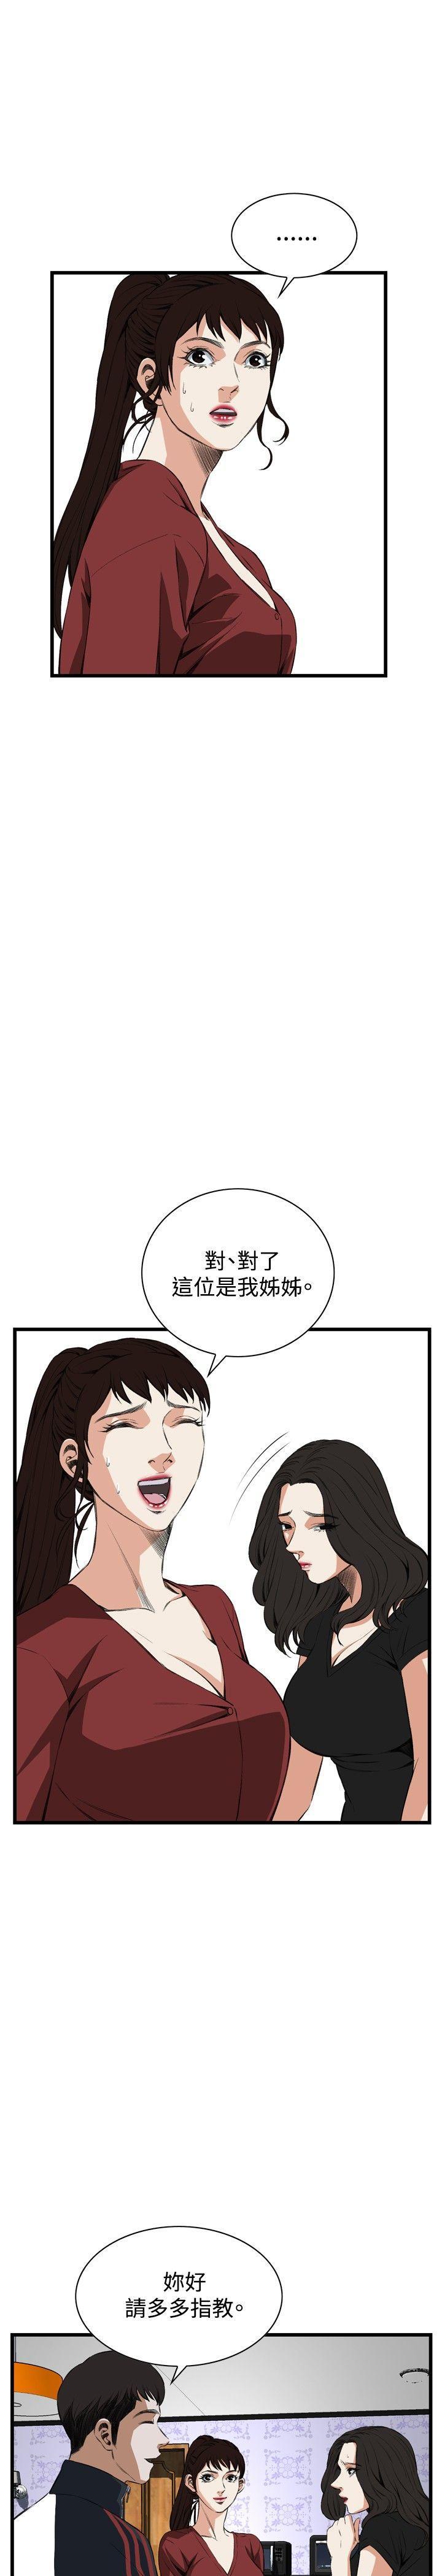 Take a Peek 偷窥 Ch.39~60 [Chinese]中文 540